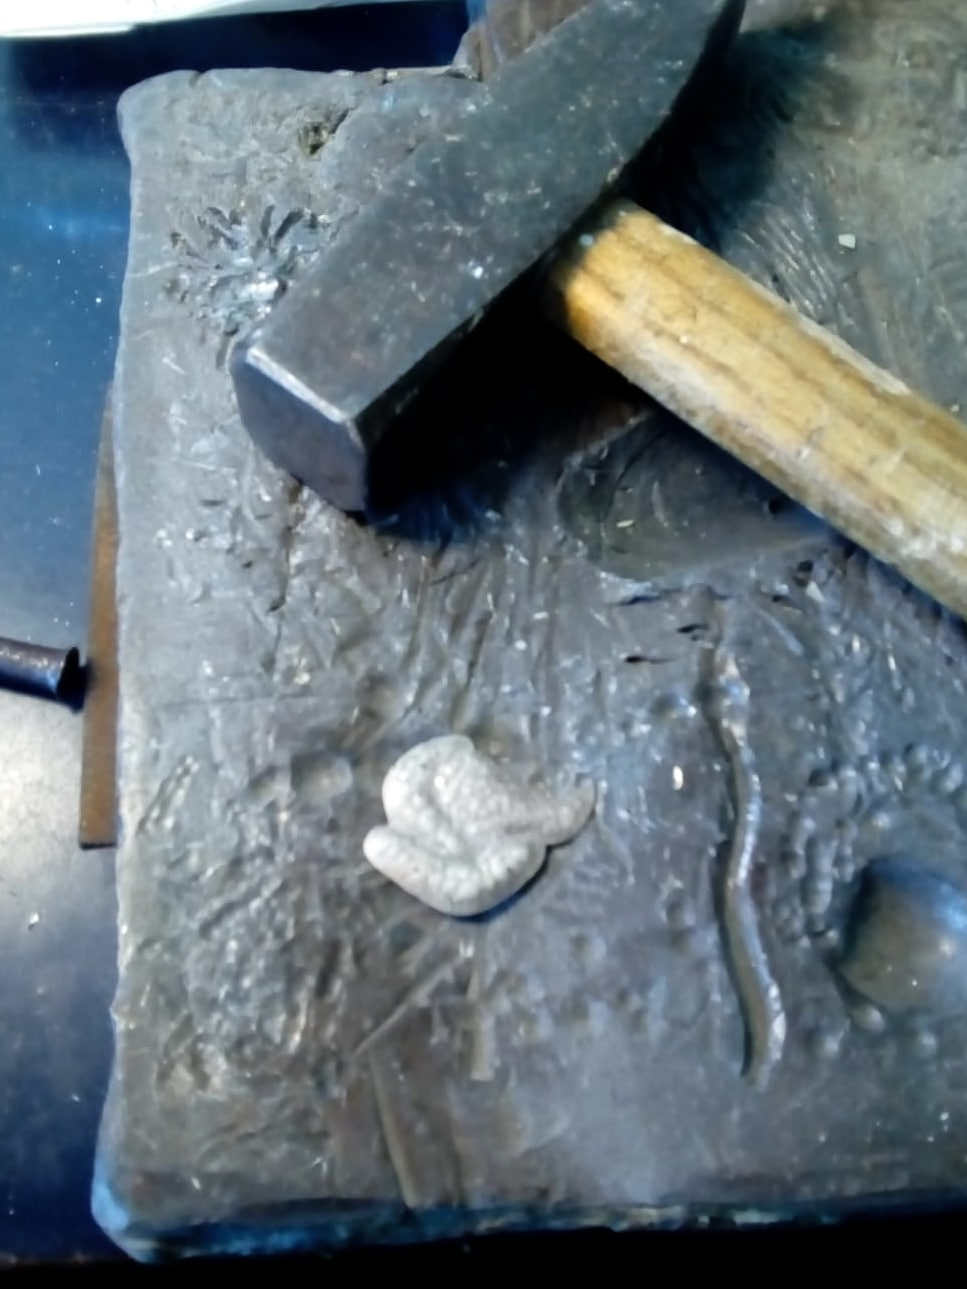 Tara Lois Jewellery chasing silver design on lead